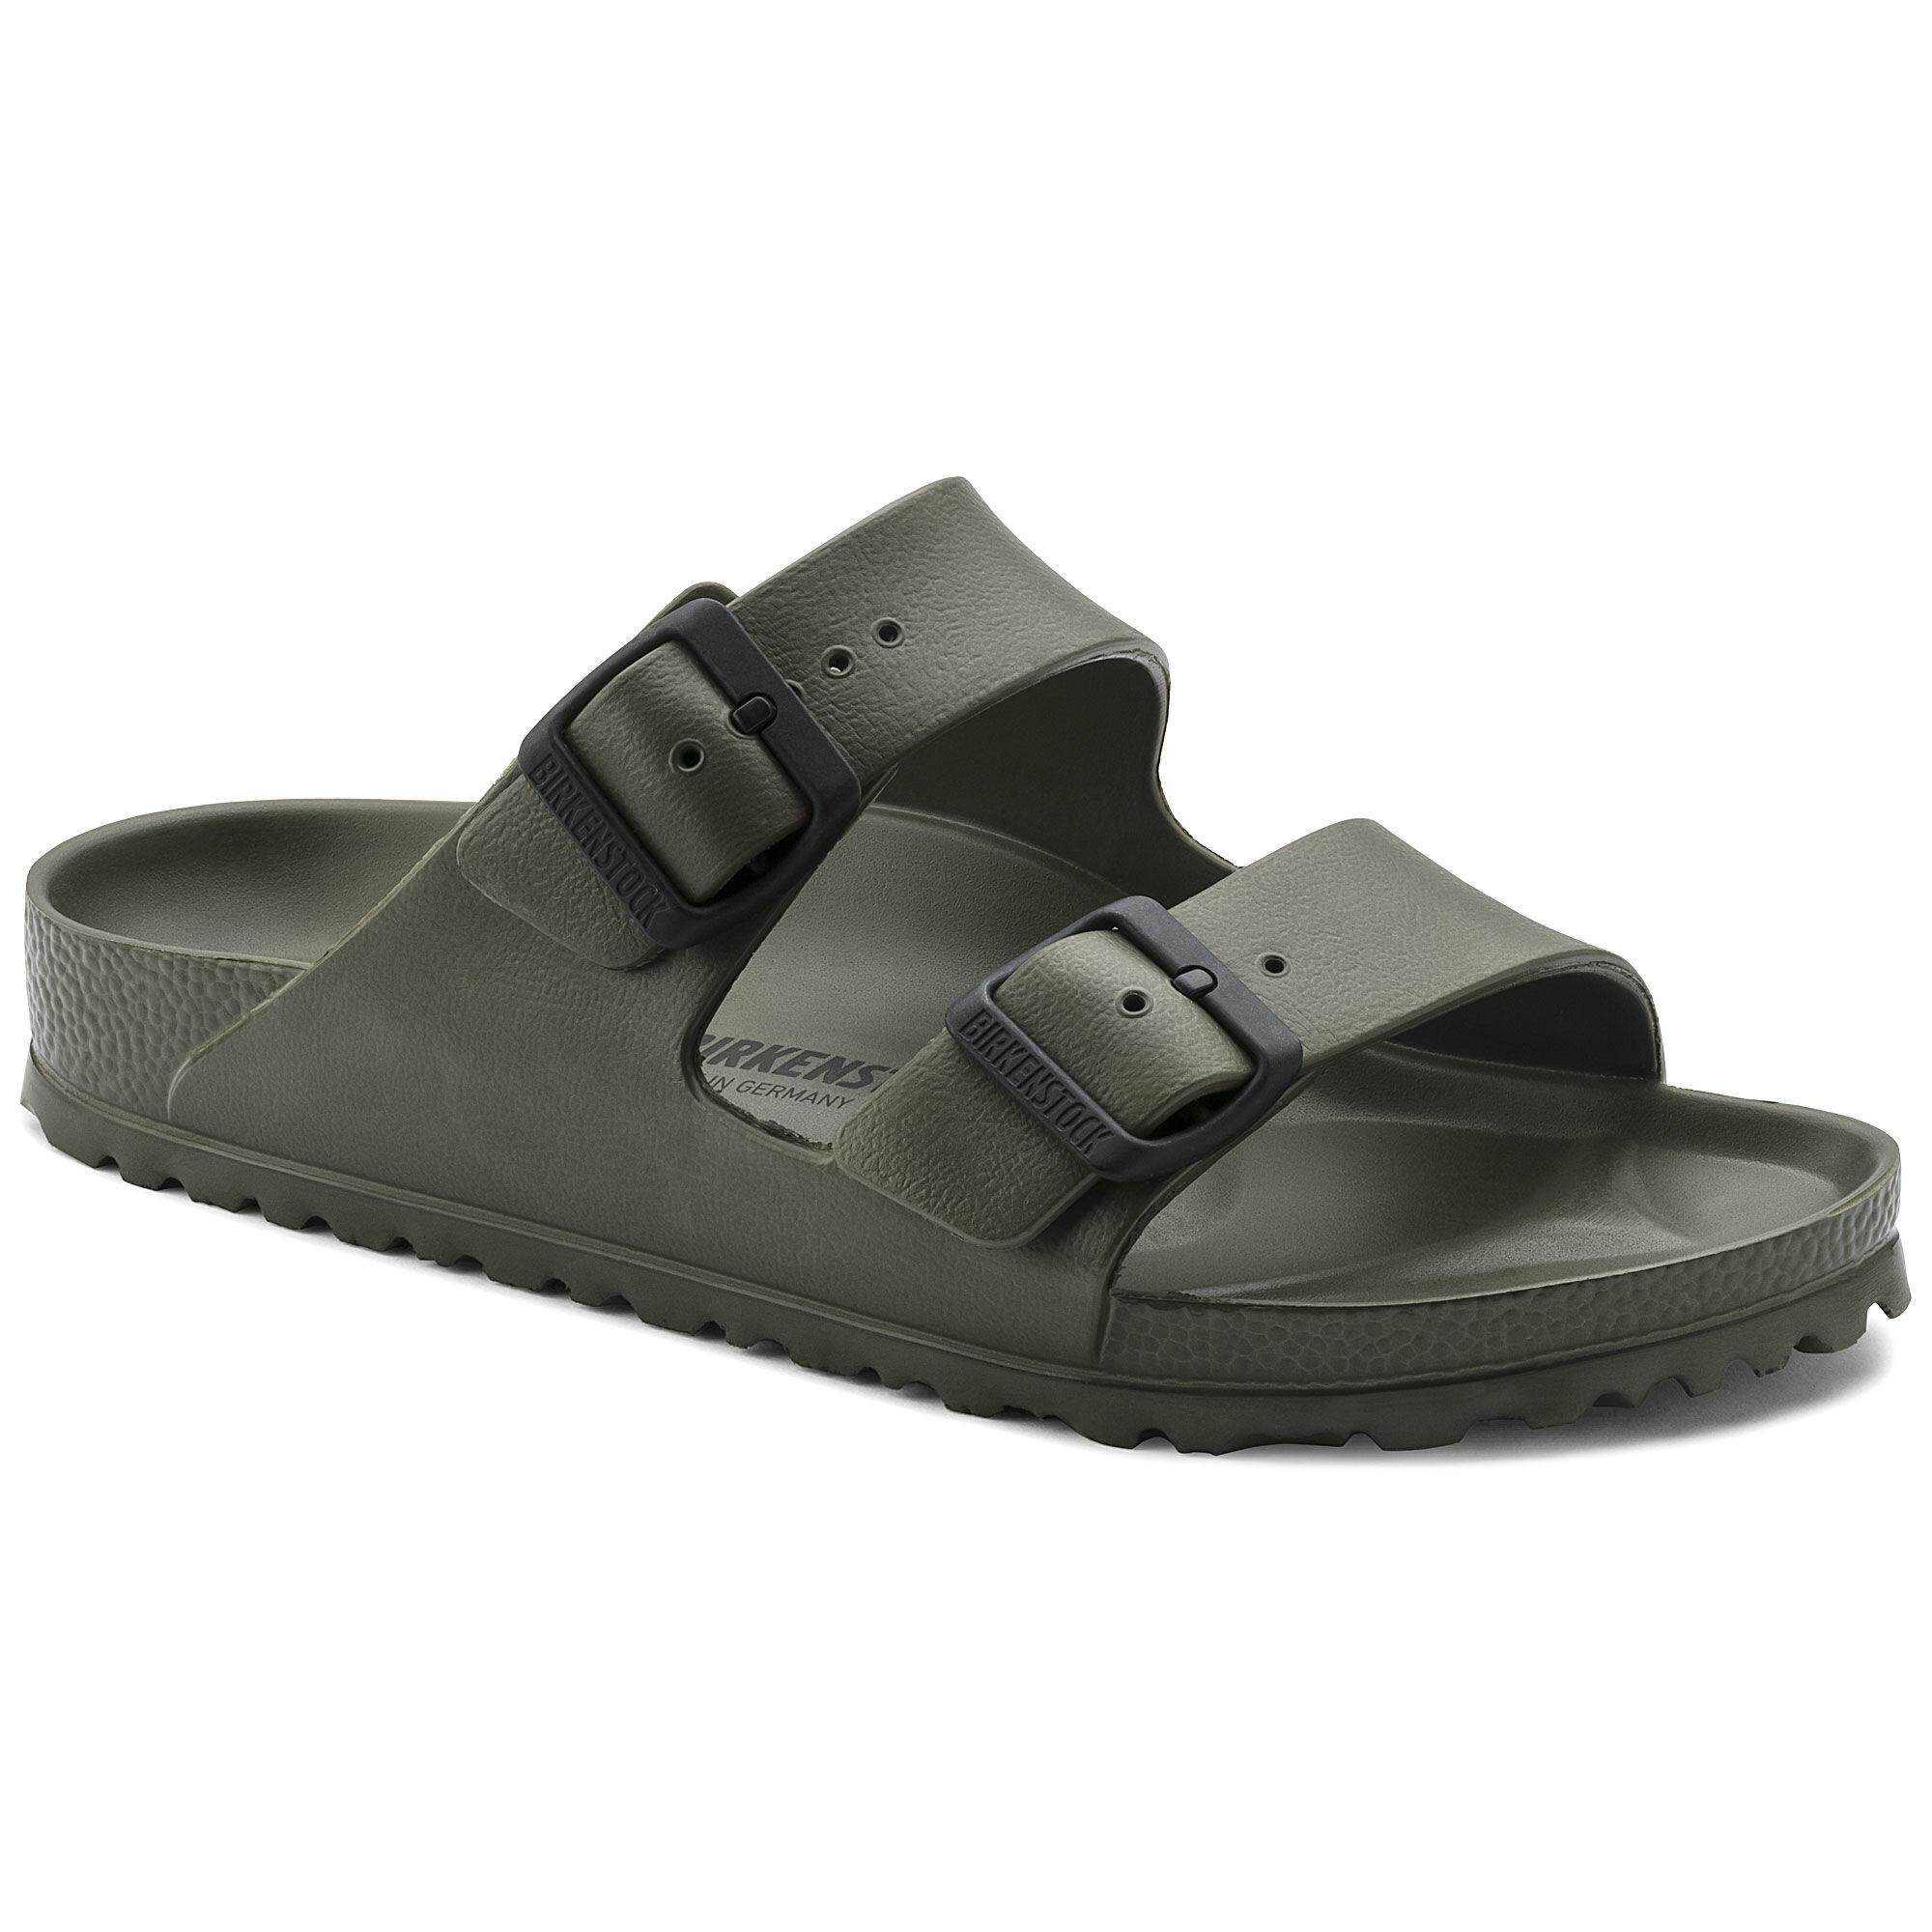 Birkenstocks Arizona EVA Khaki Men Beach Non-slip Shoes Summer Shoes Slow-motion Travel Shoes